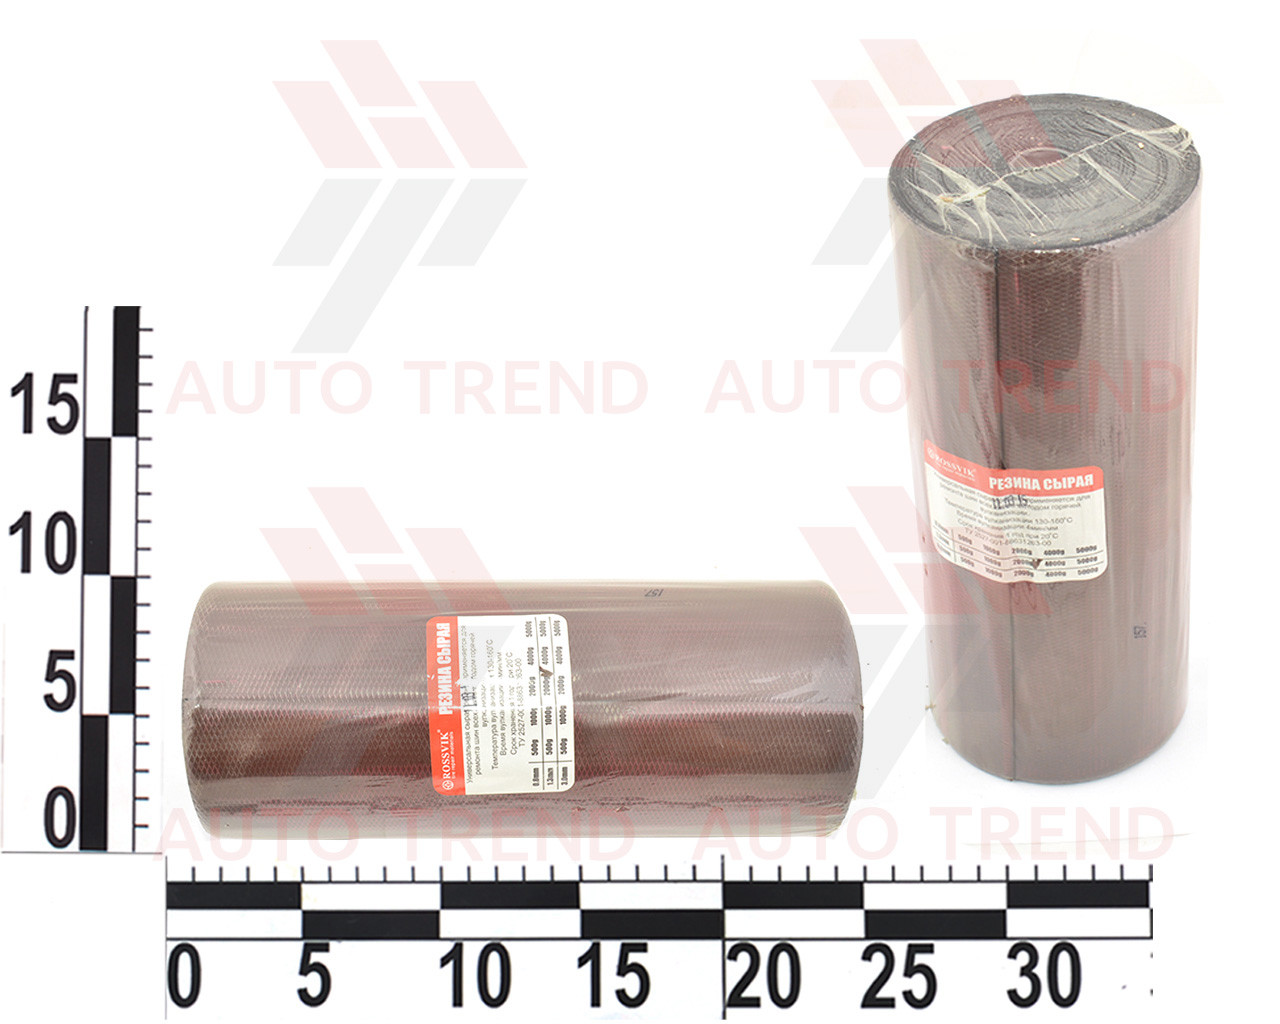 Резина сырая 240х1,3мм, 2кг